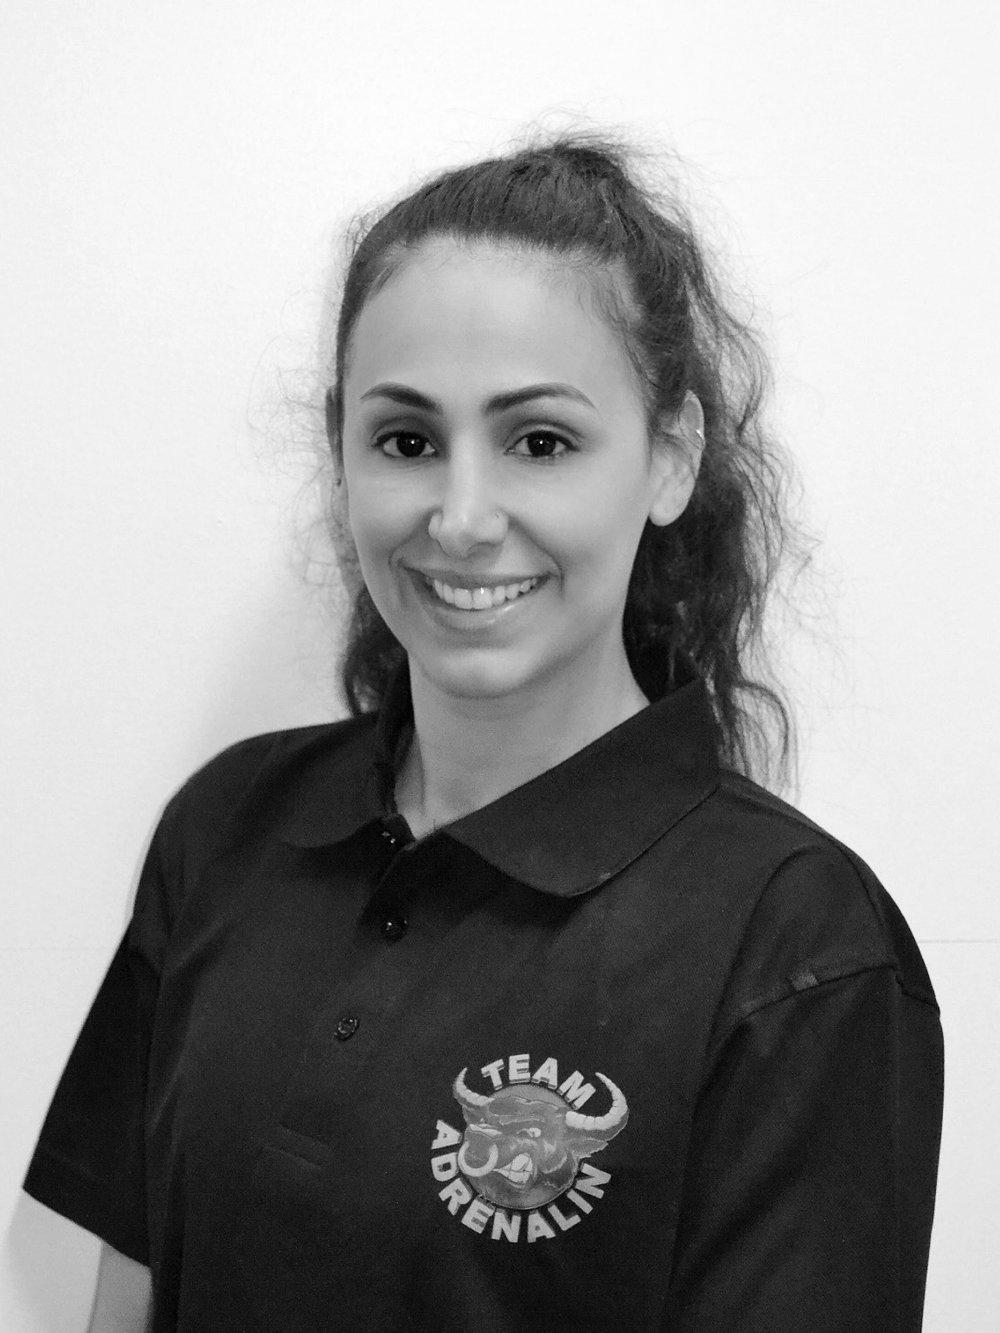 Melissa Presti